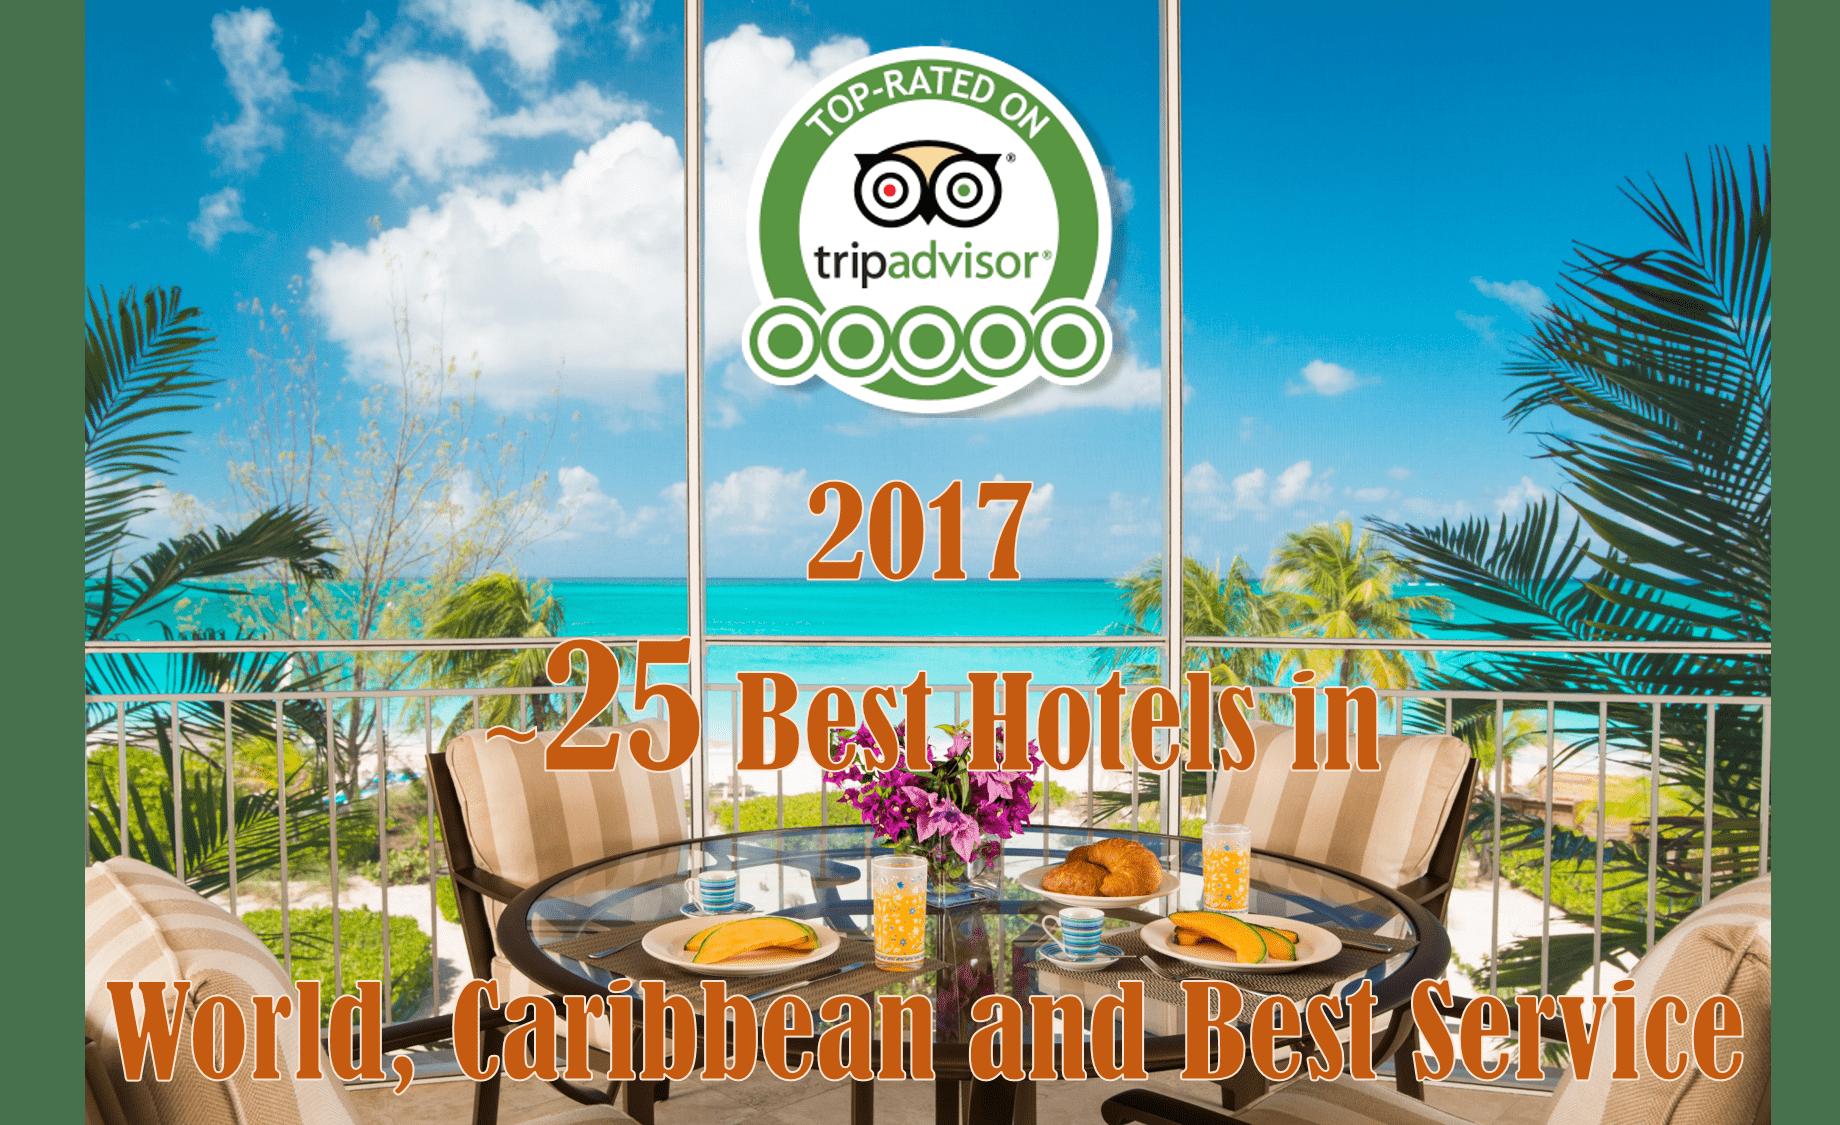 2017 Tripadvisor Awards